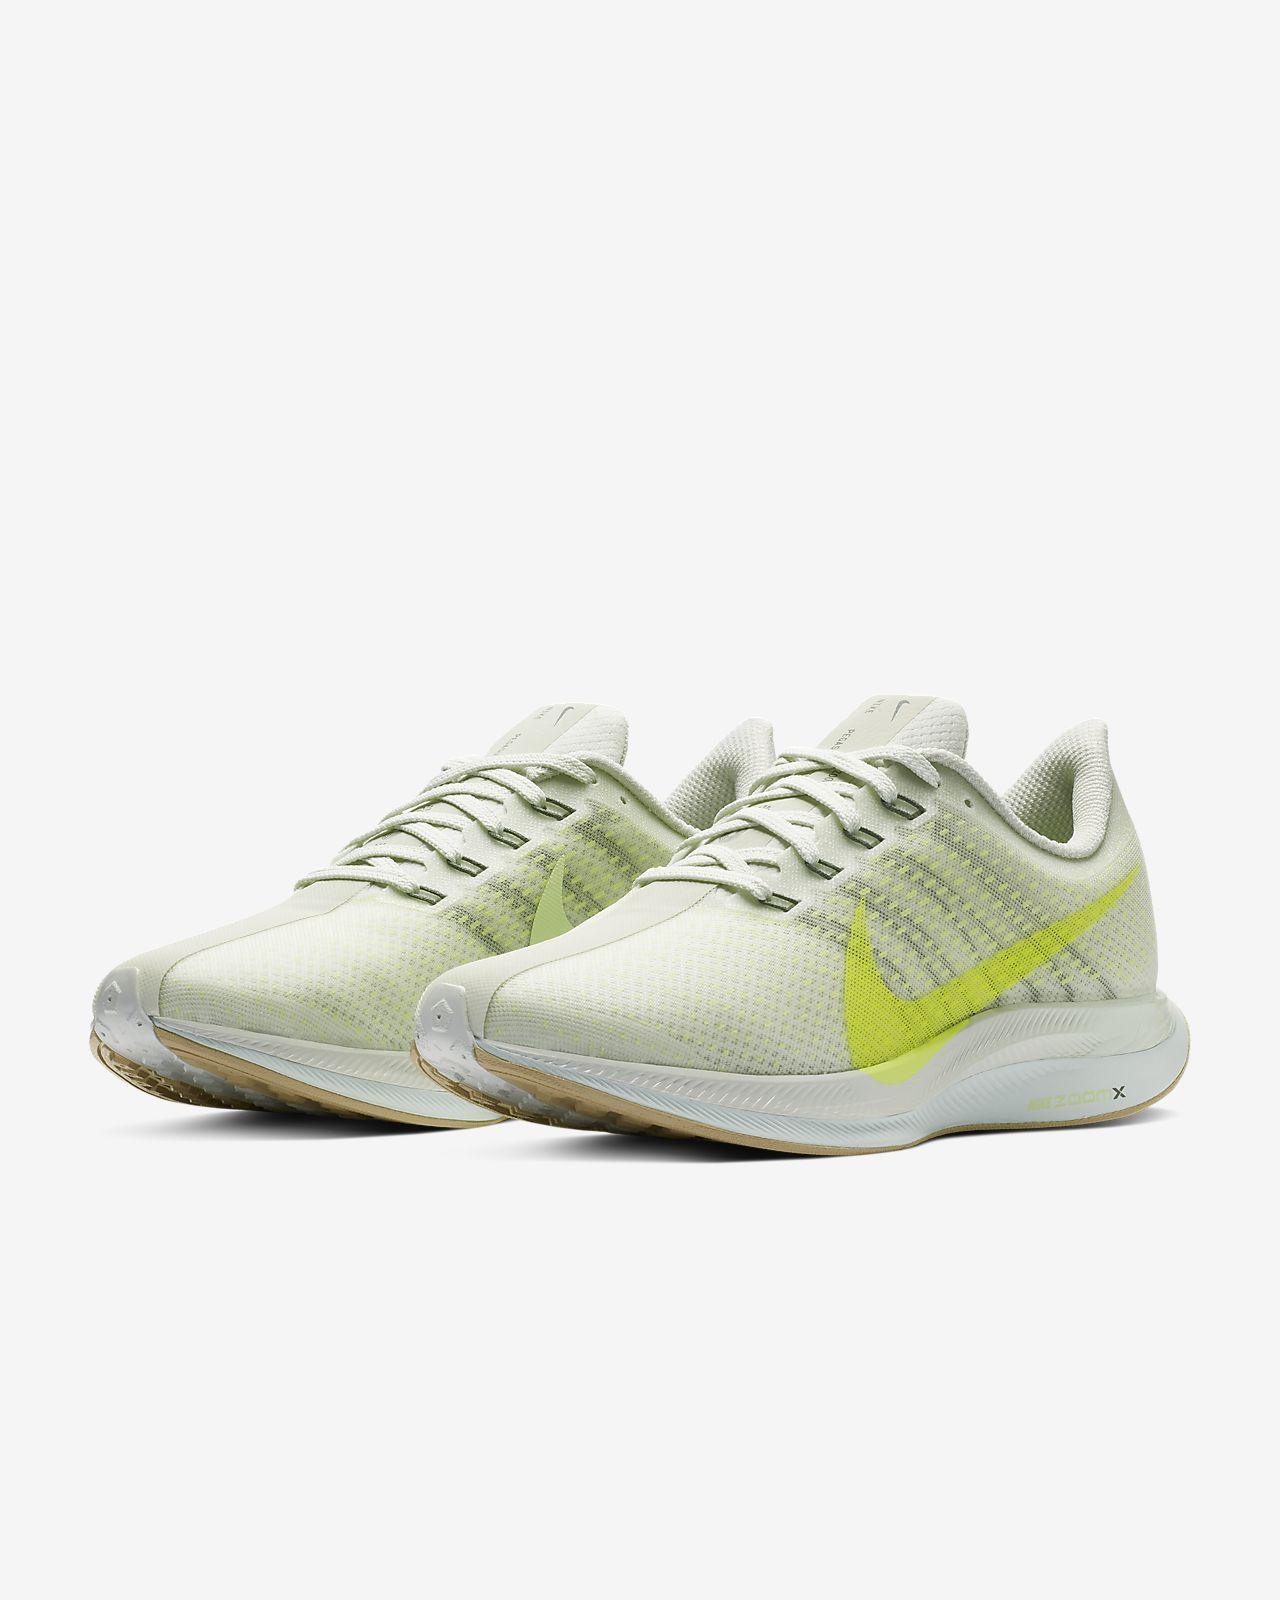 6606628875ae8e Nike Zoom Pegasus Turbo Women s Running Shoe. Nike.com